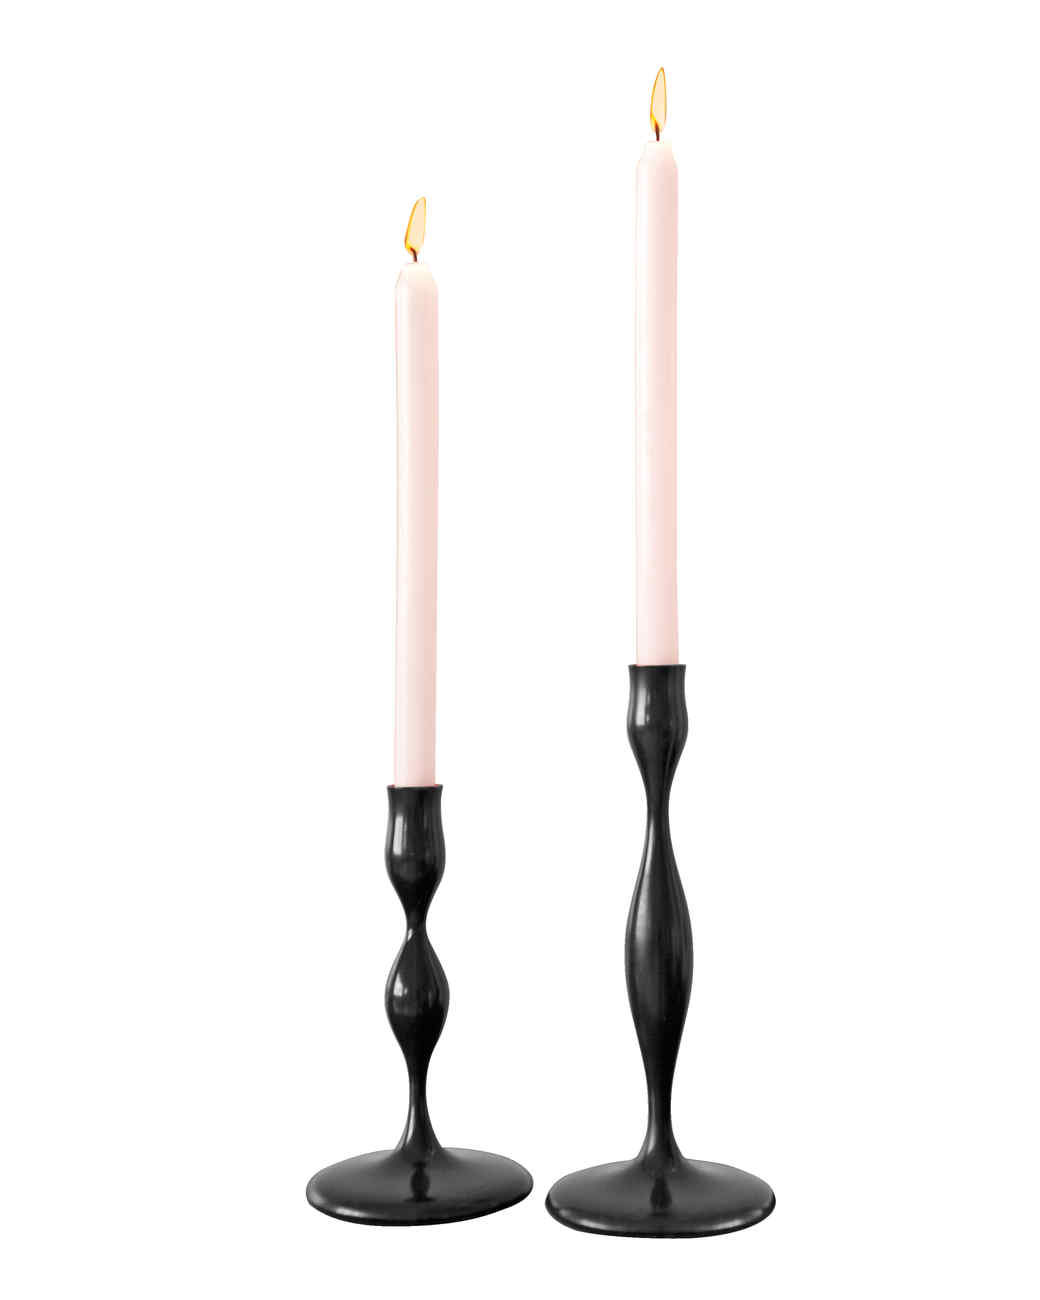 bronze-full-set-candles-ms110988.jpg